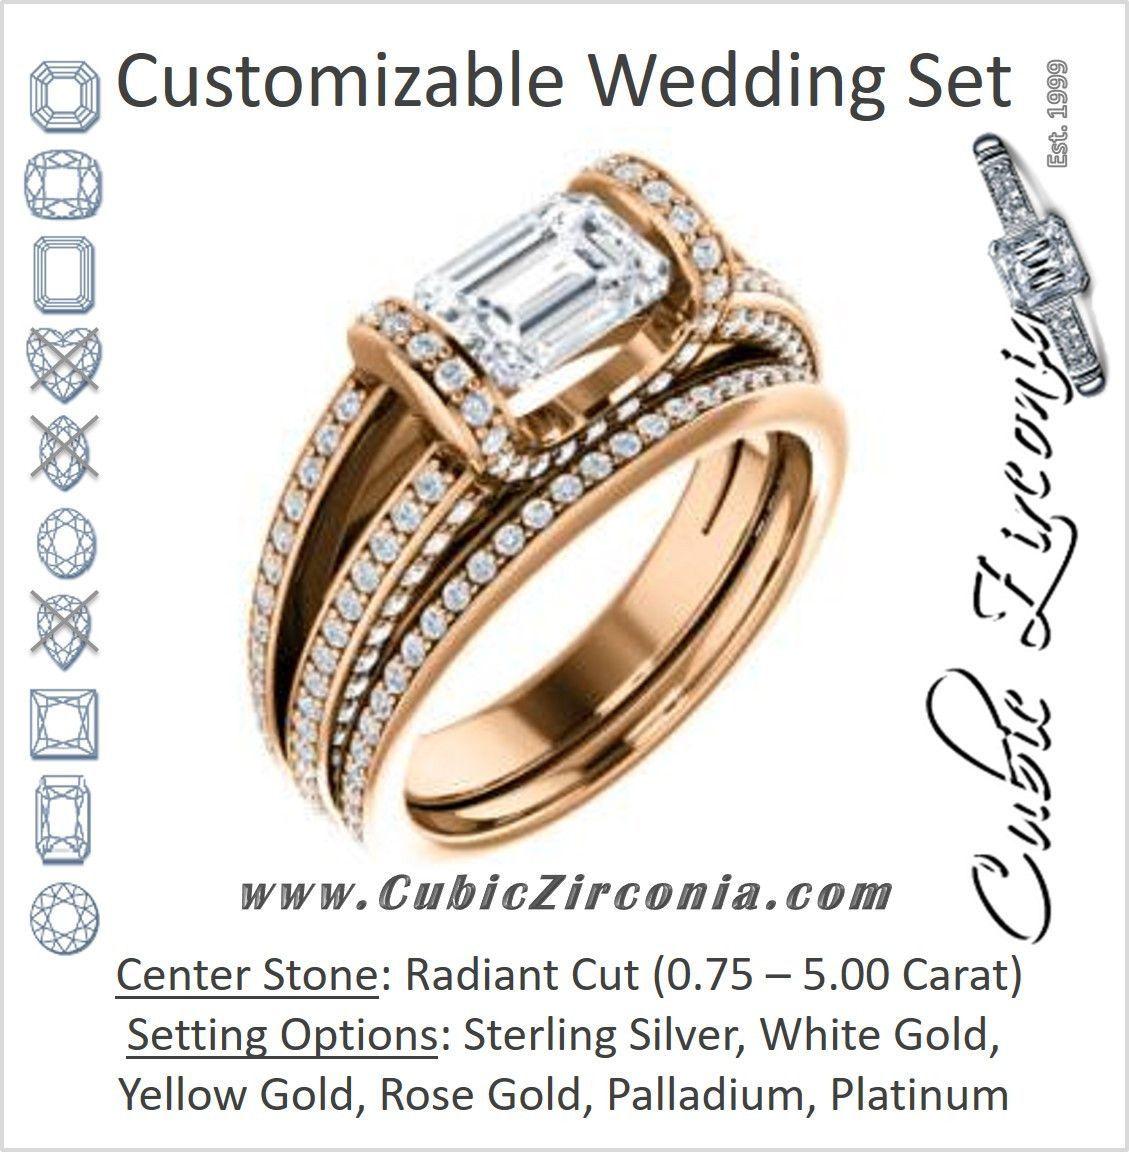 Cz wedding set featuring the scarlett engagement ring radiant cut